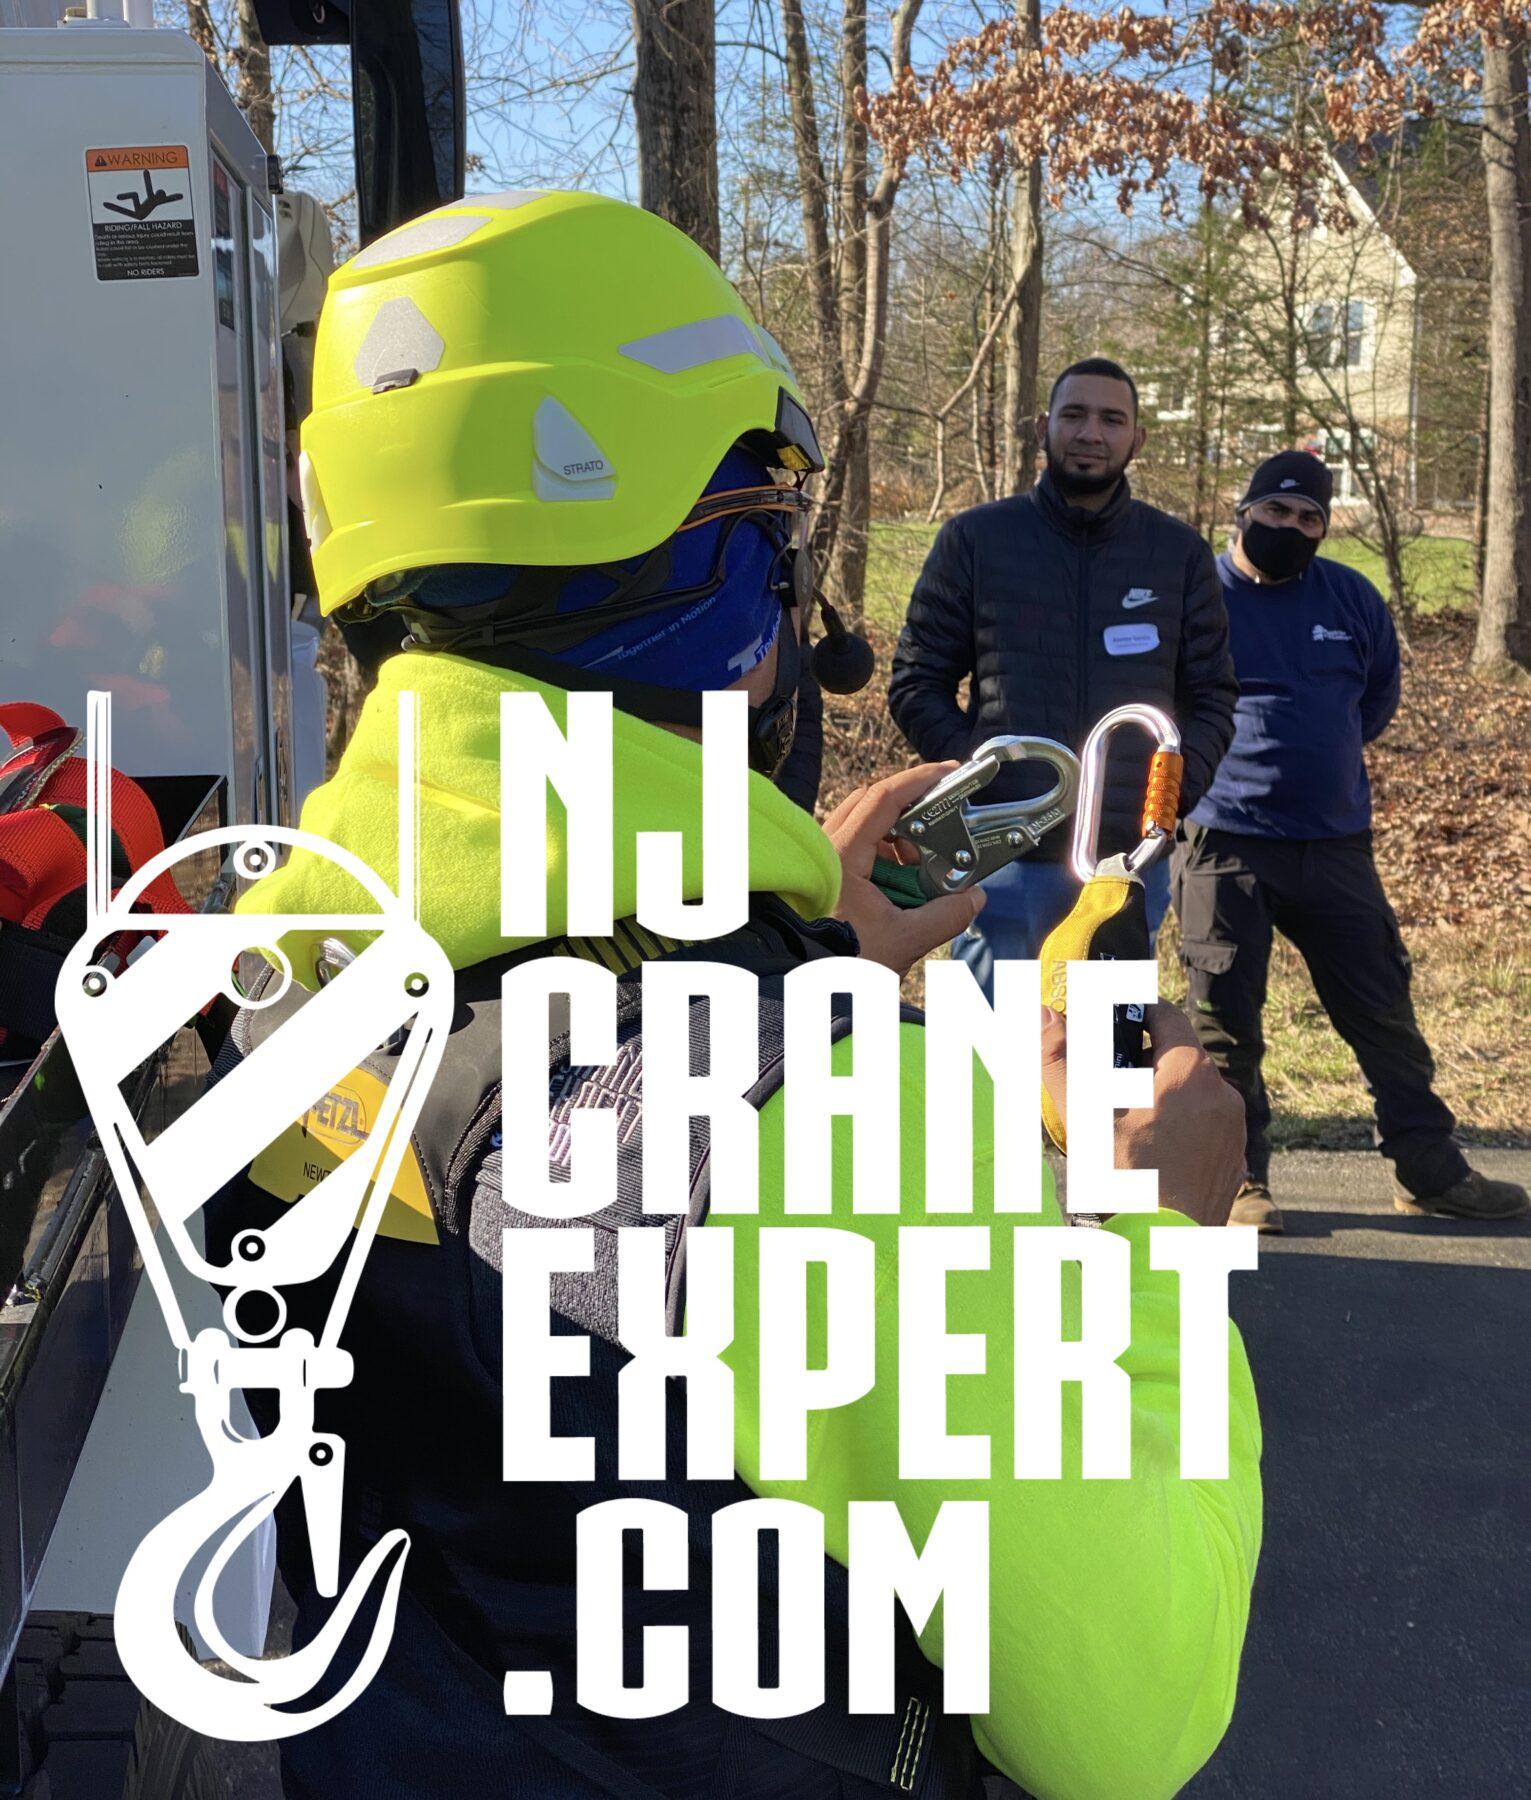 Petzl Technical Partner - NJ Crane Expert